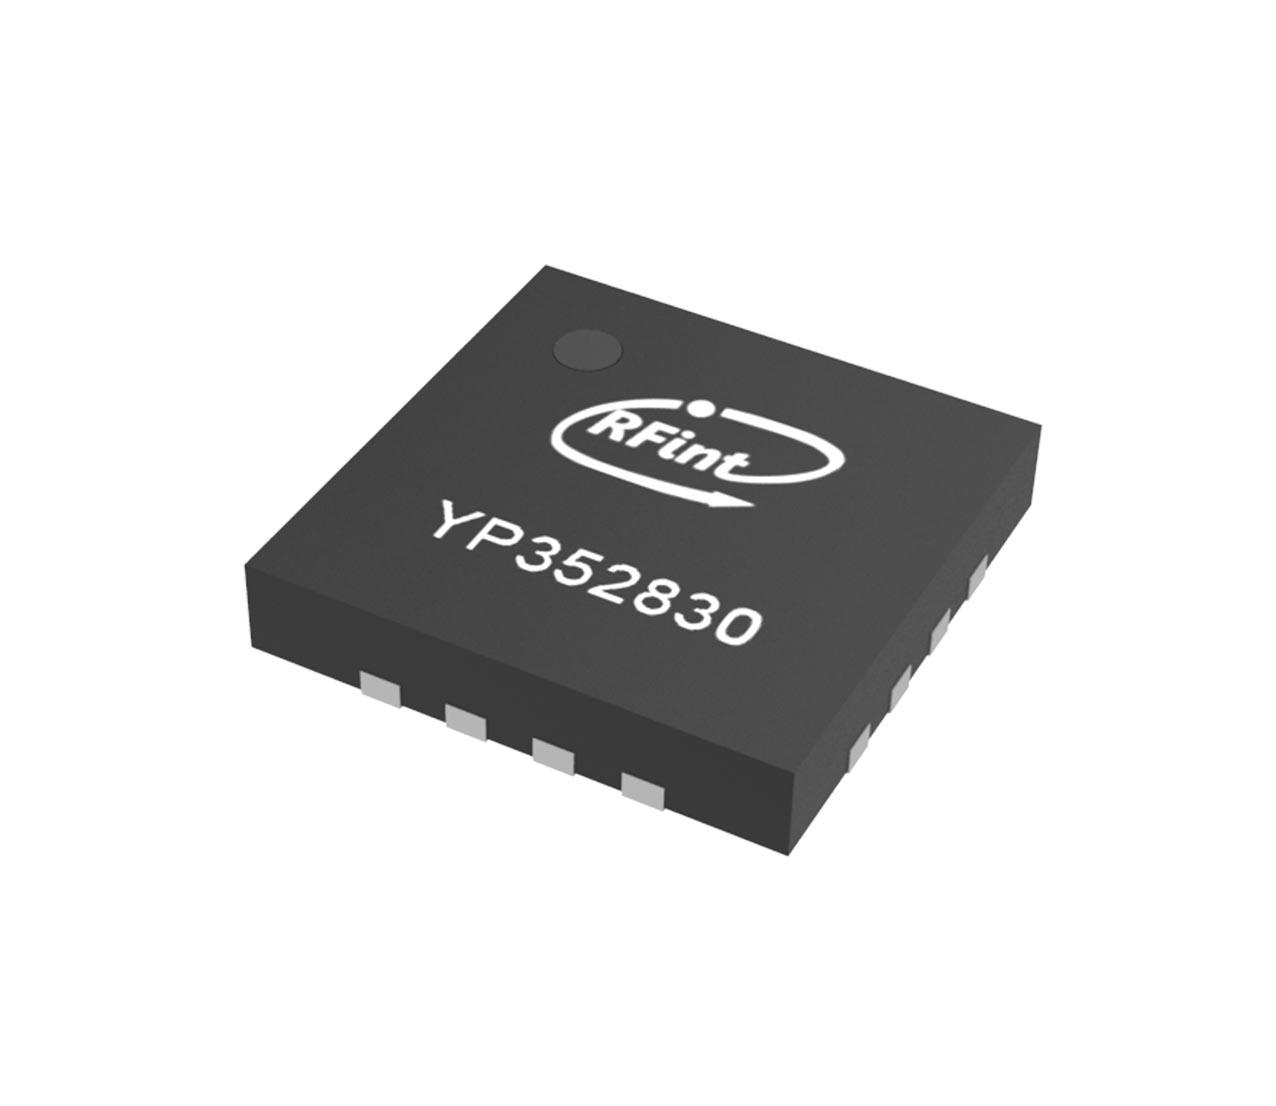 YP352830